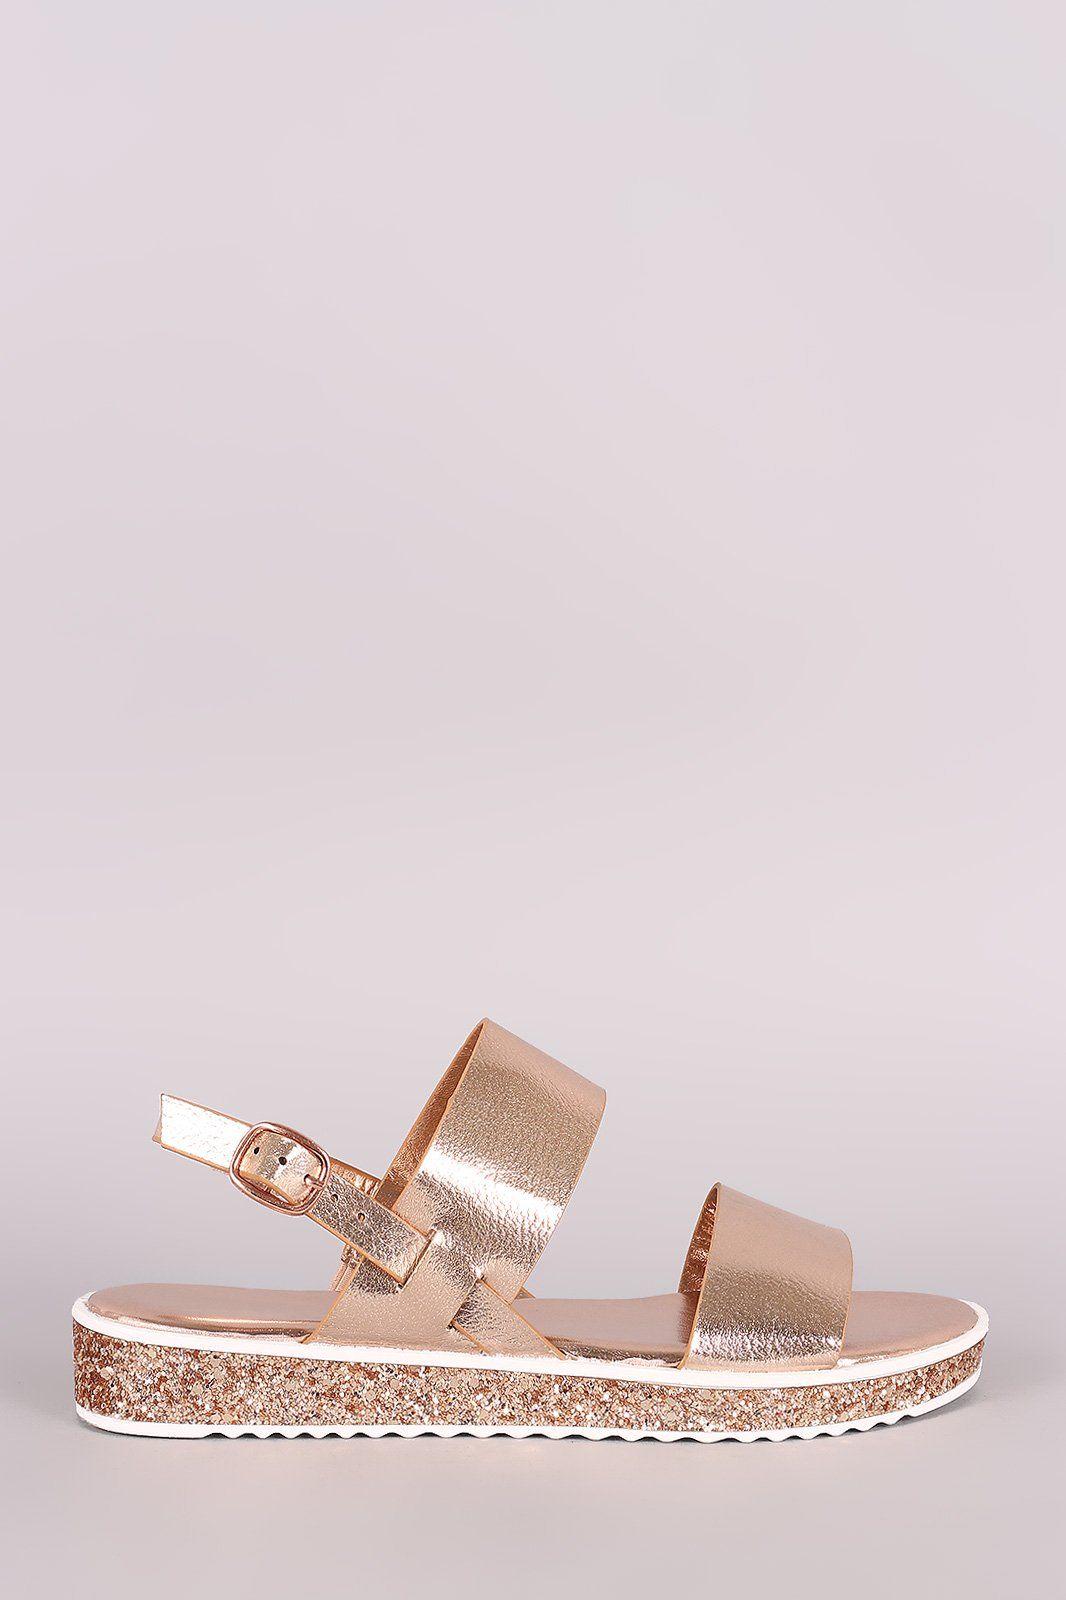 4a6d15606649 Bamboo Double Band Glitter Lug Sole Flatform Sandal